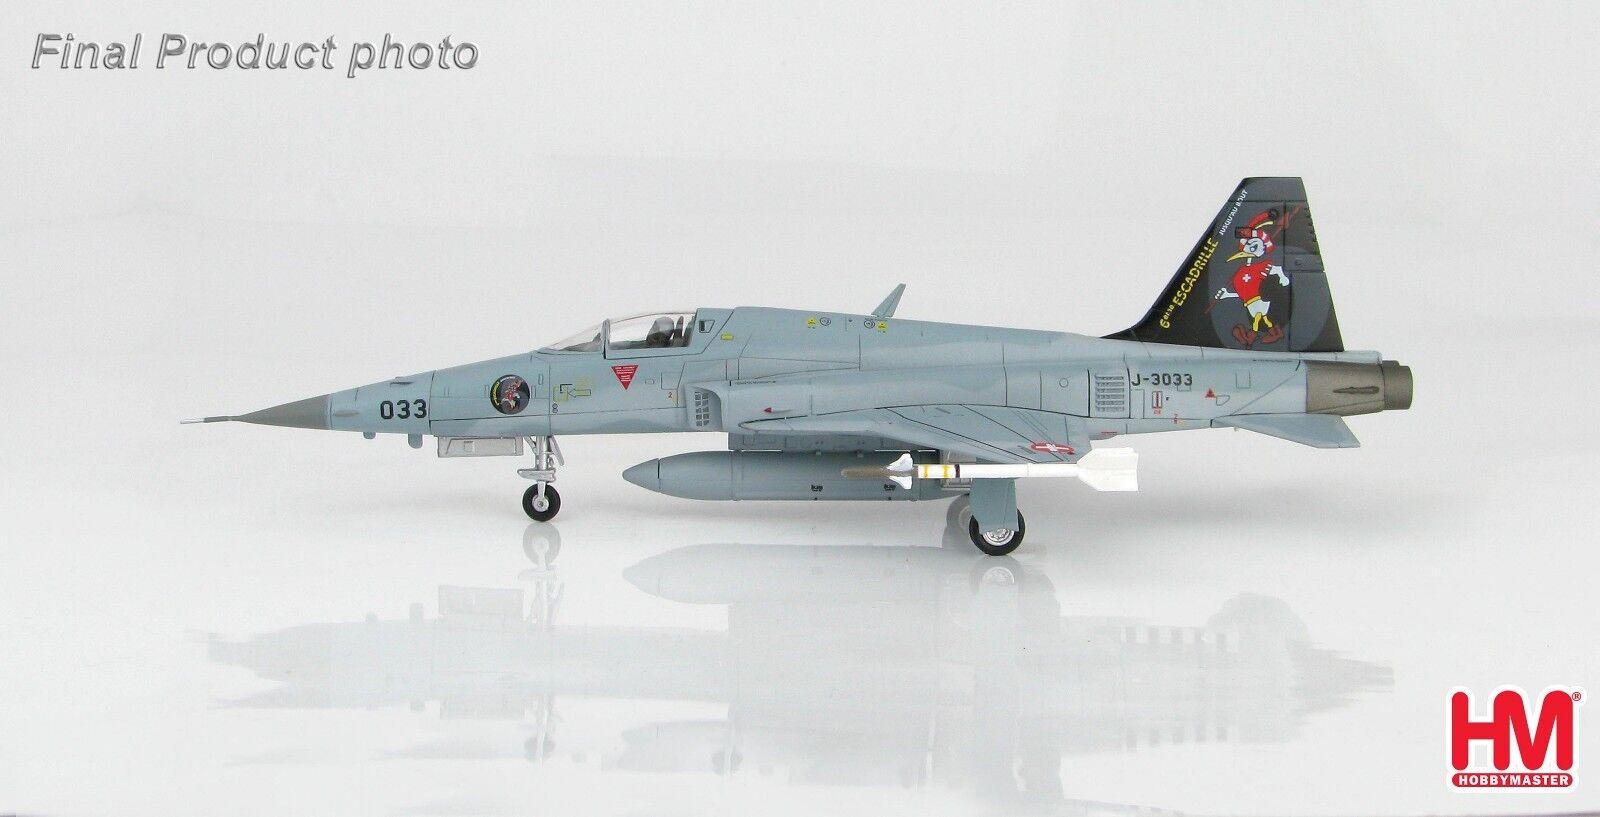 Hobby Master HA3329, Northrop F-5E Tiger II J-3033, Staffel 6, 2017, 1 72